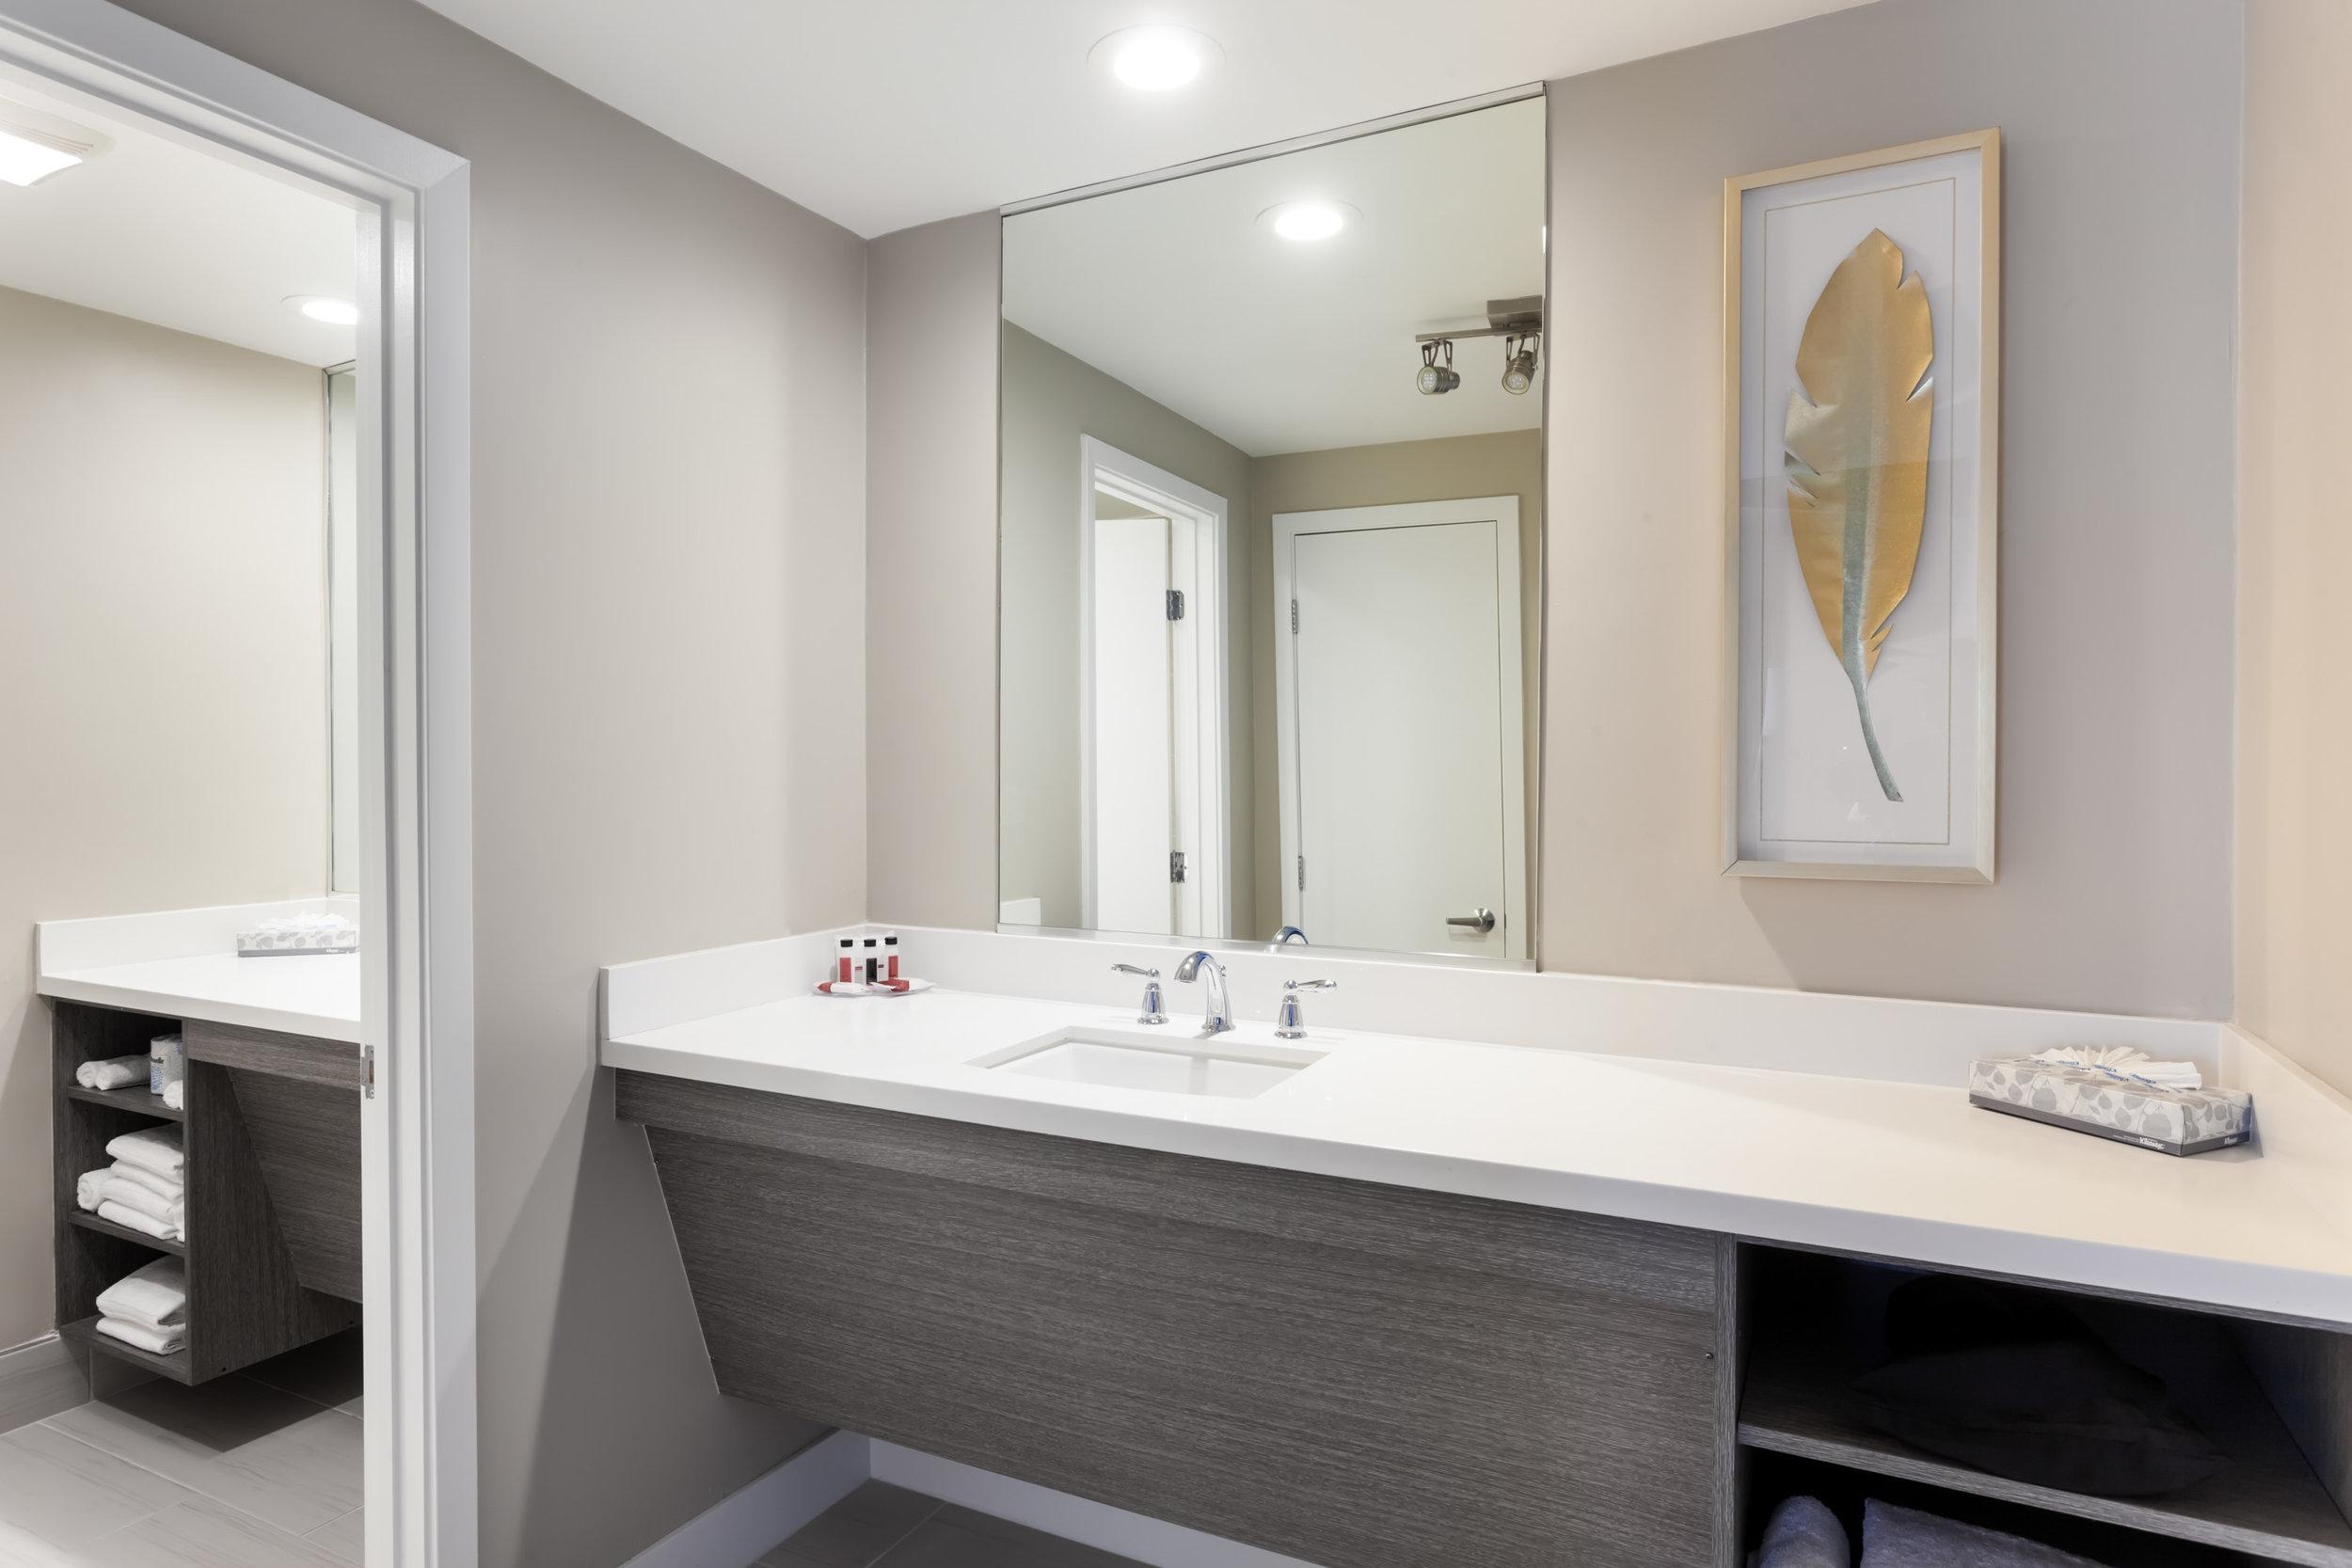 King Suite Bathroom counter